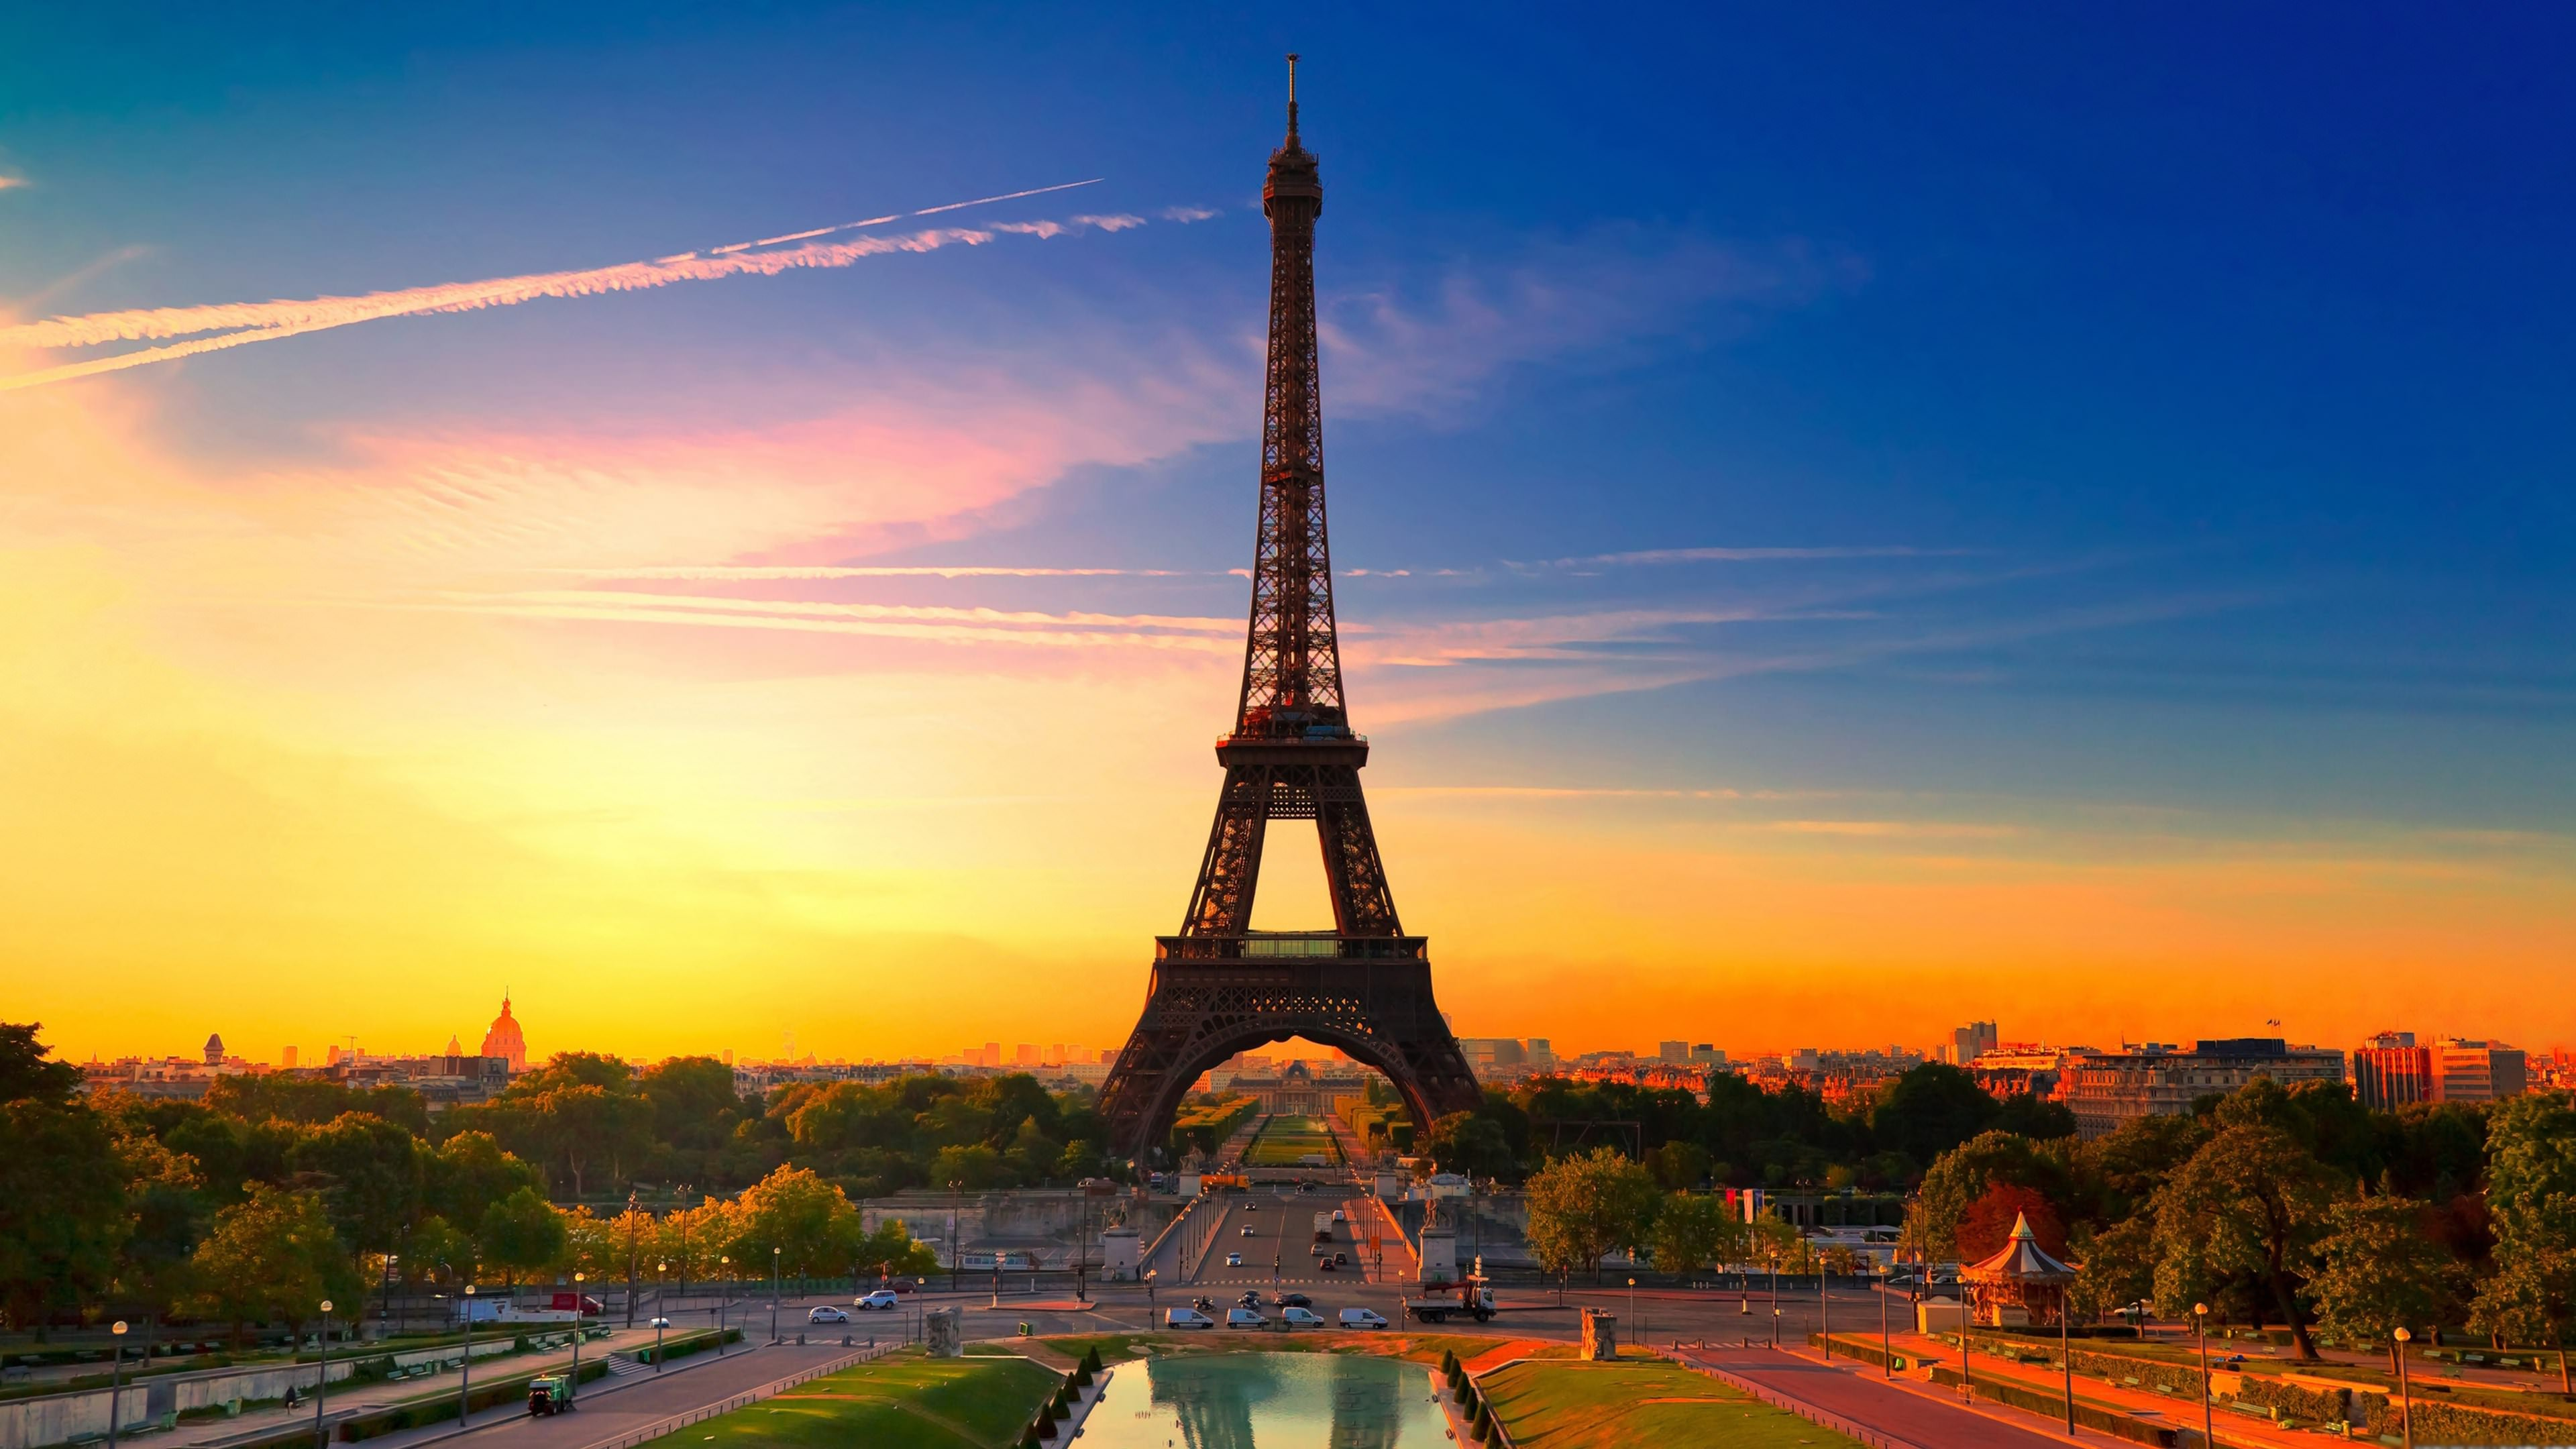 Ultra HD Eiffel Tower Wallpaper